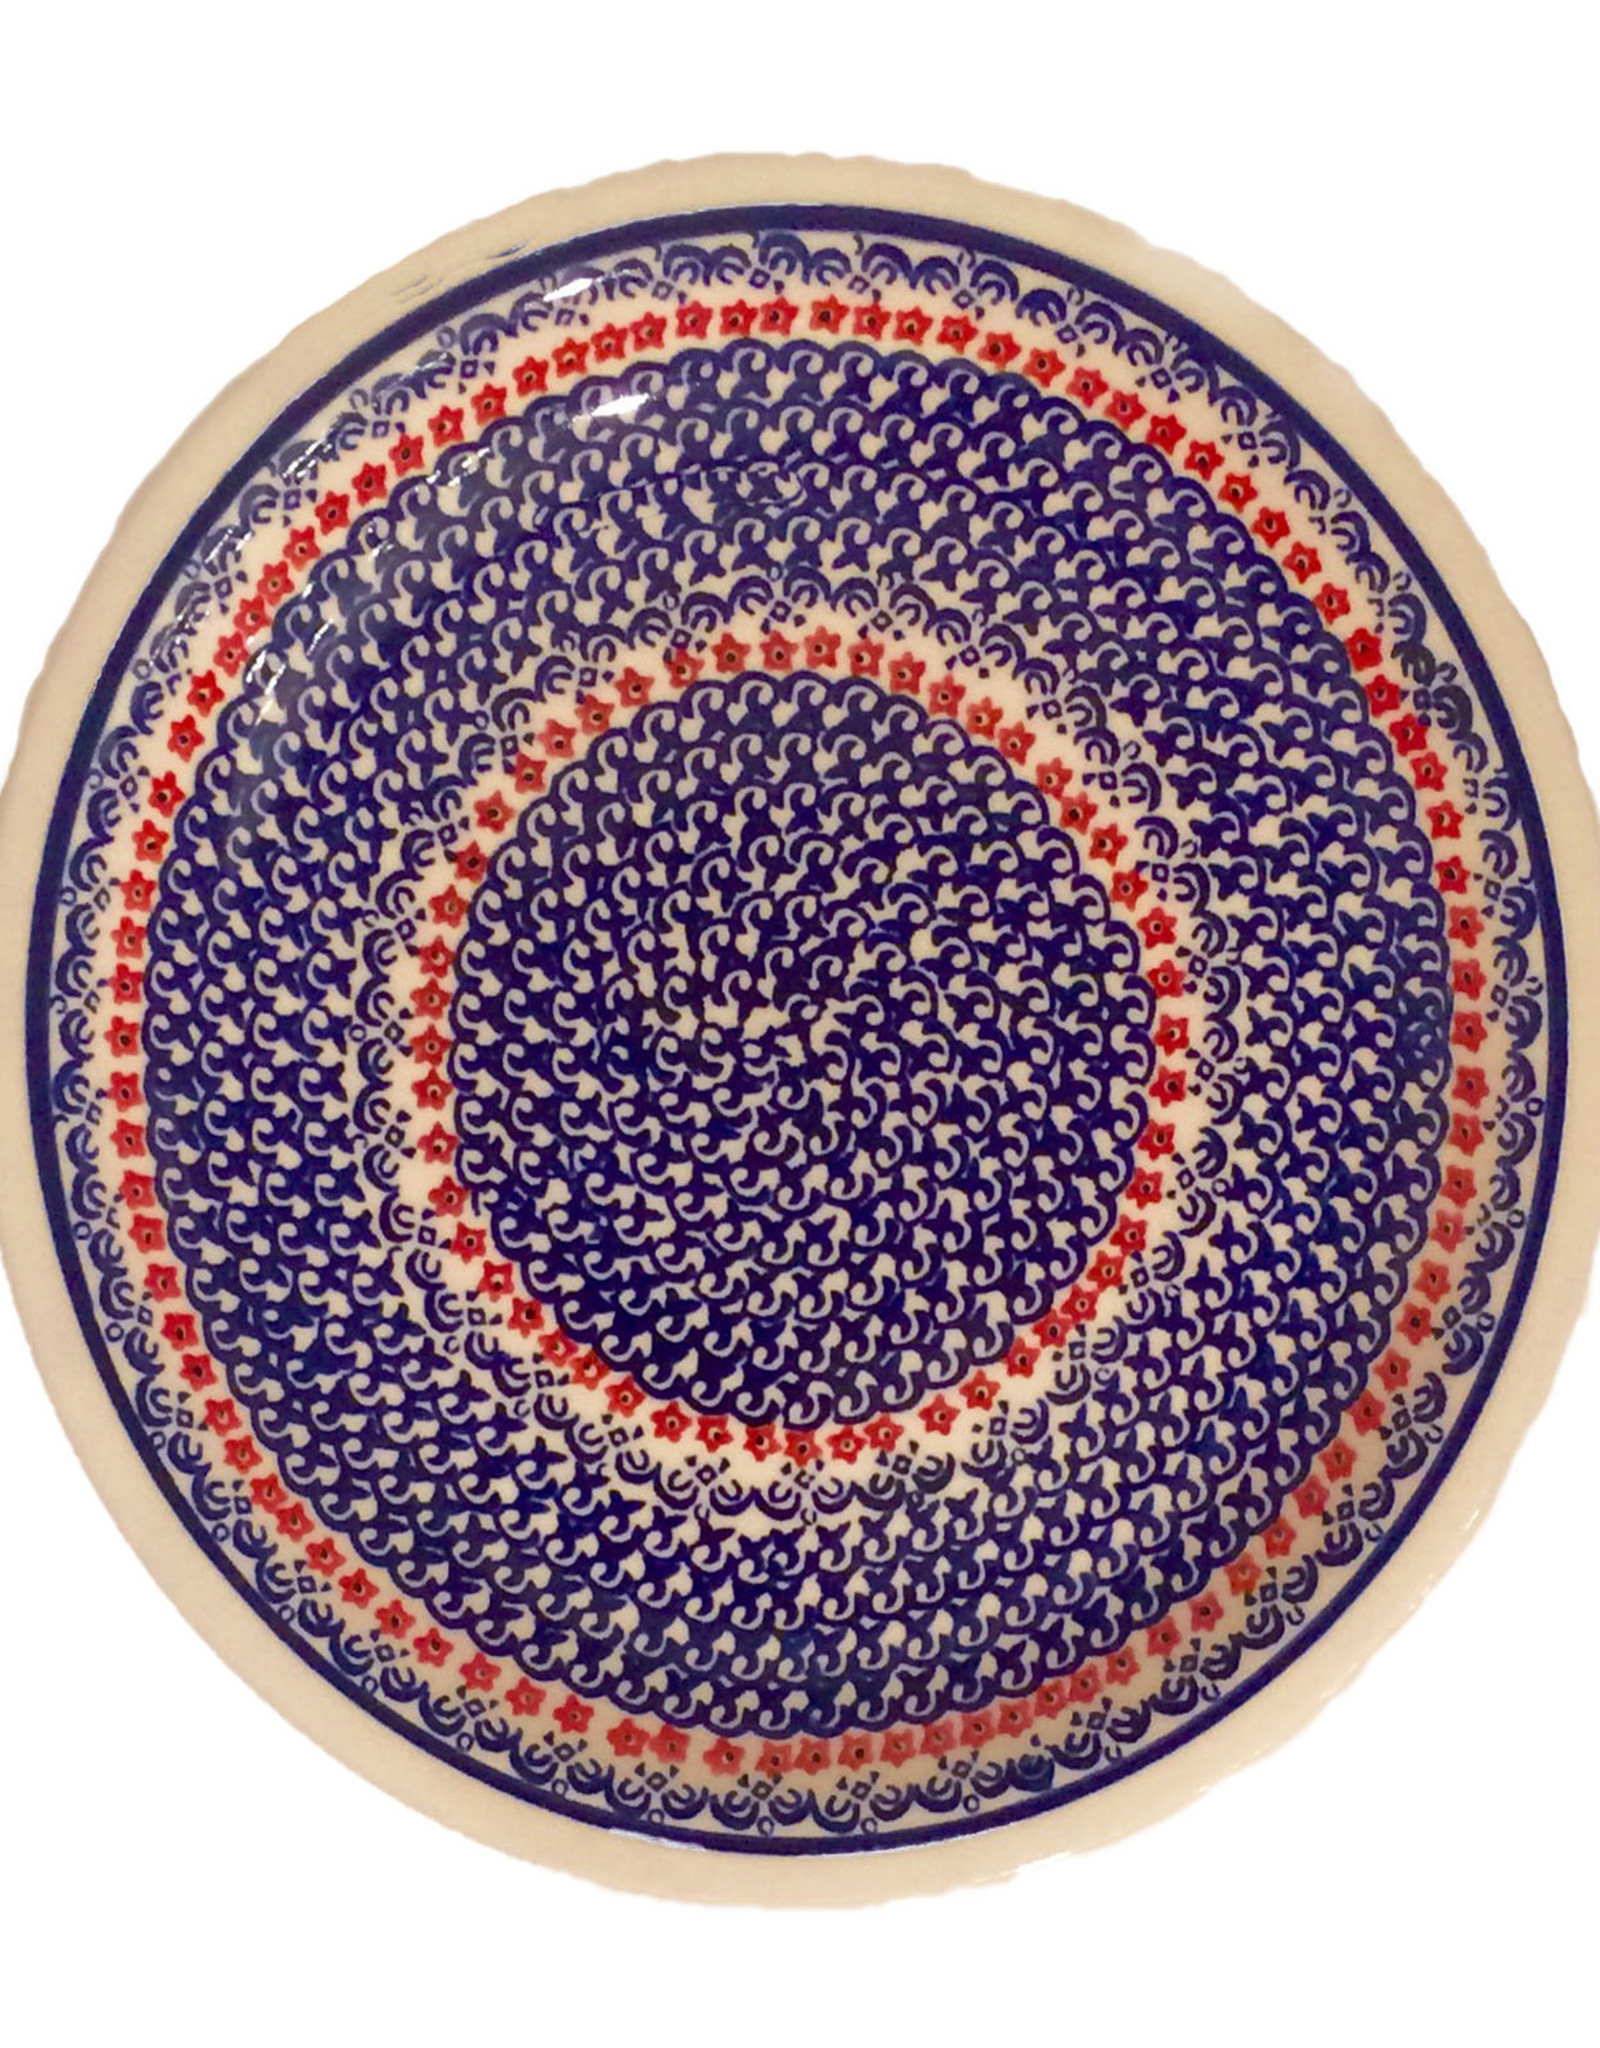 Dinner Plate - Vistula